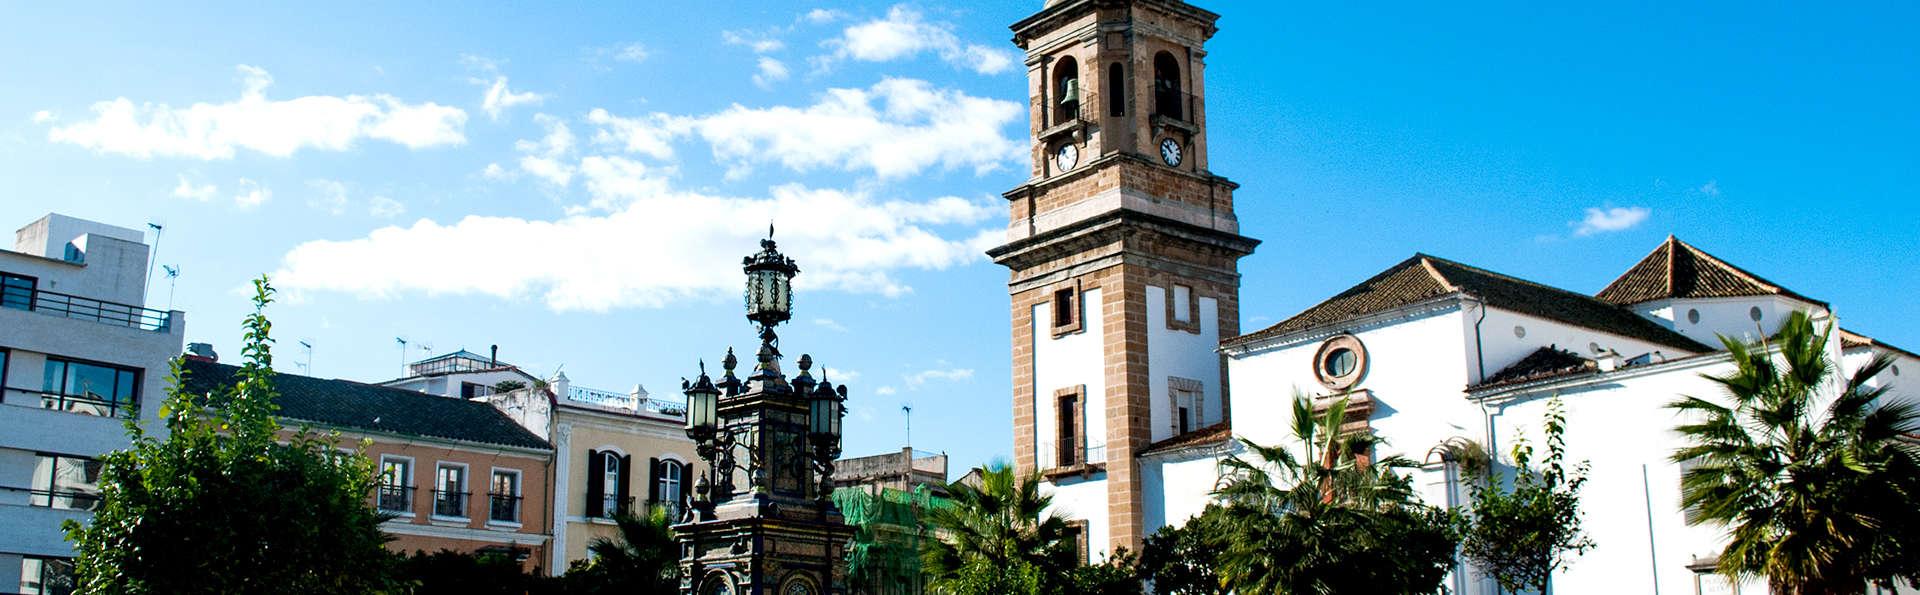 Aura Hotel Algeciras - Edit_Destination3.jpg